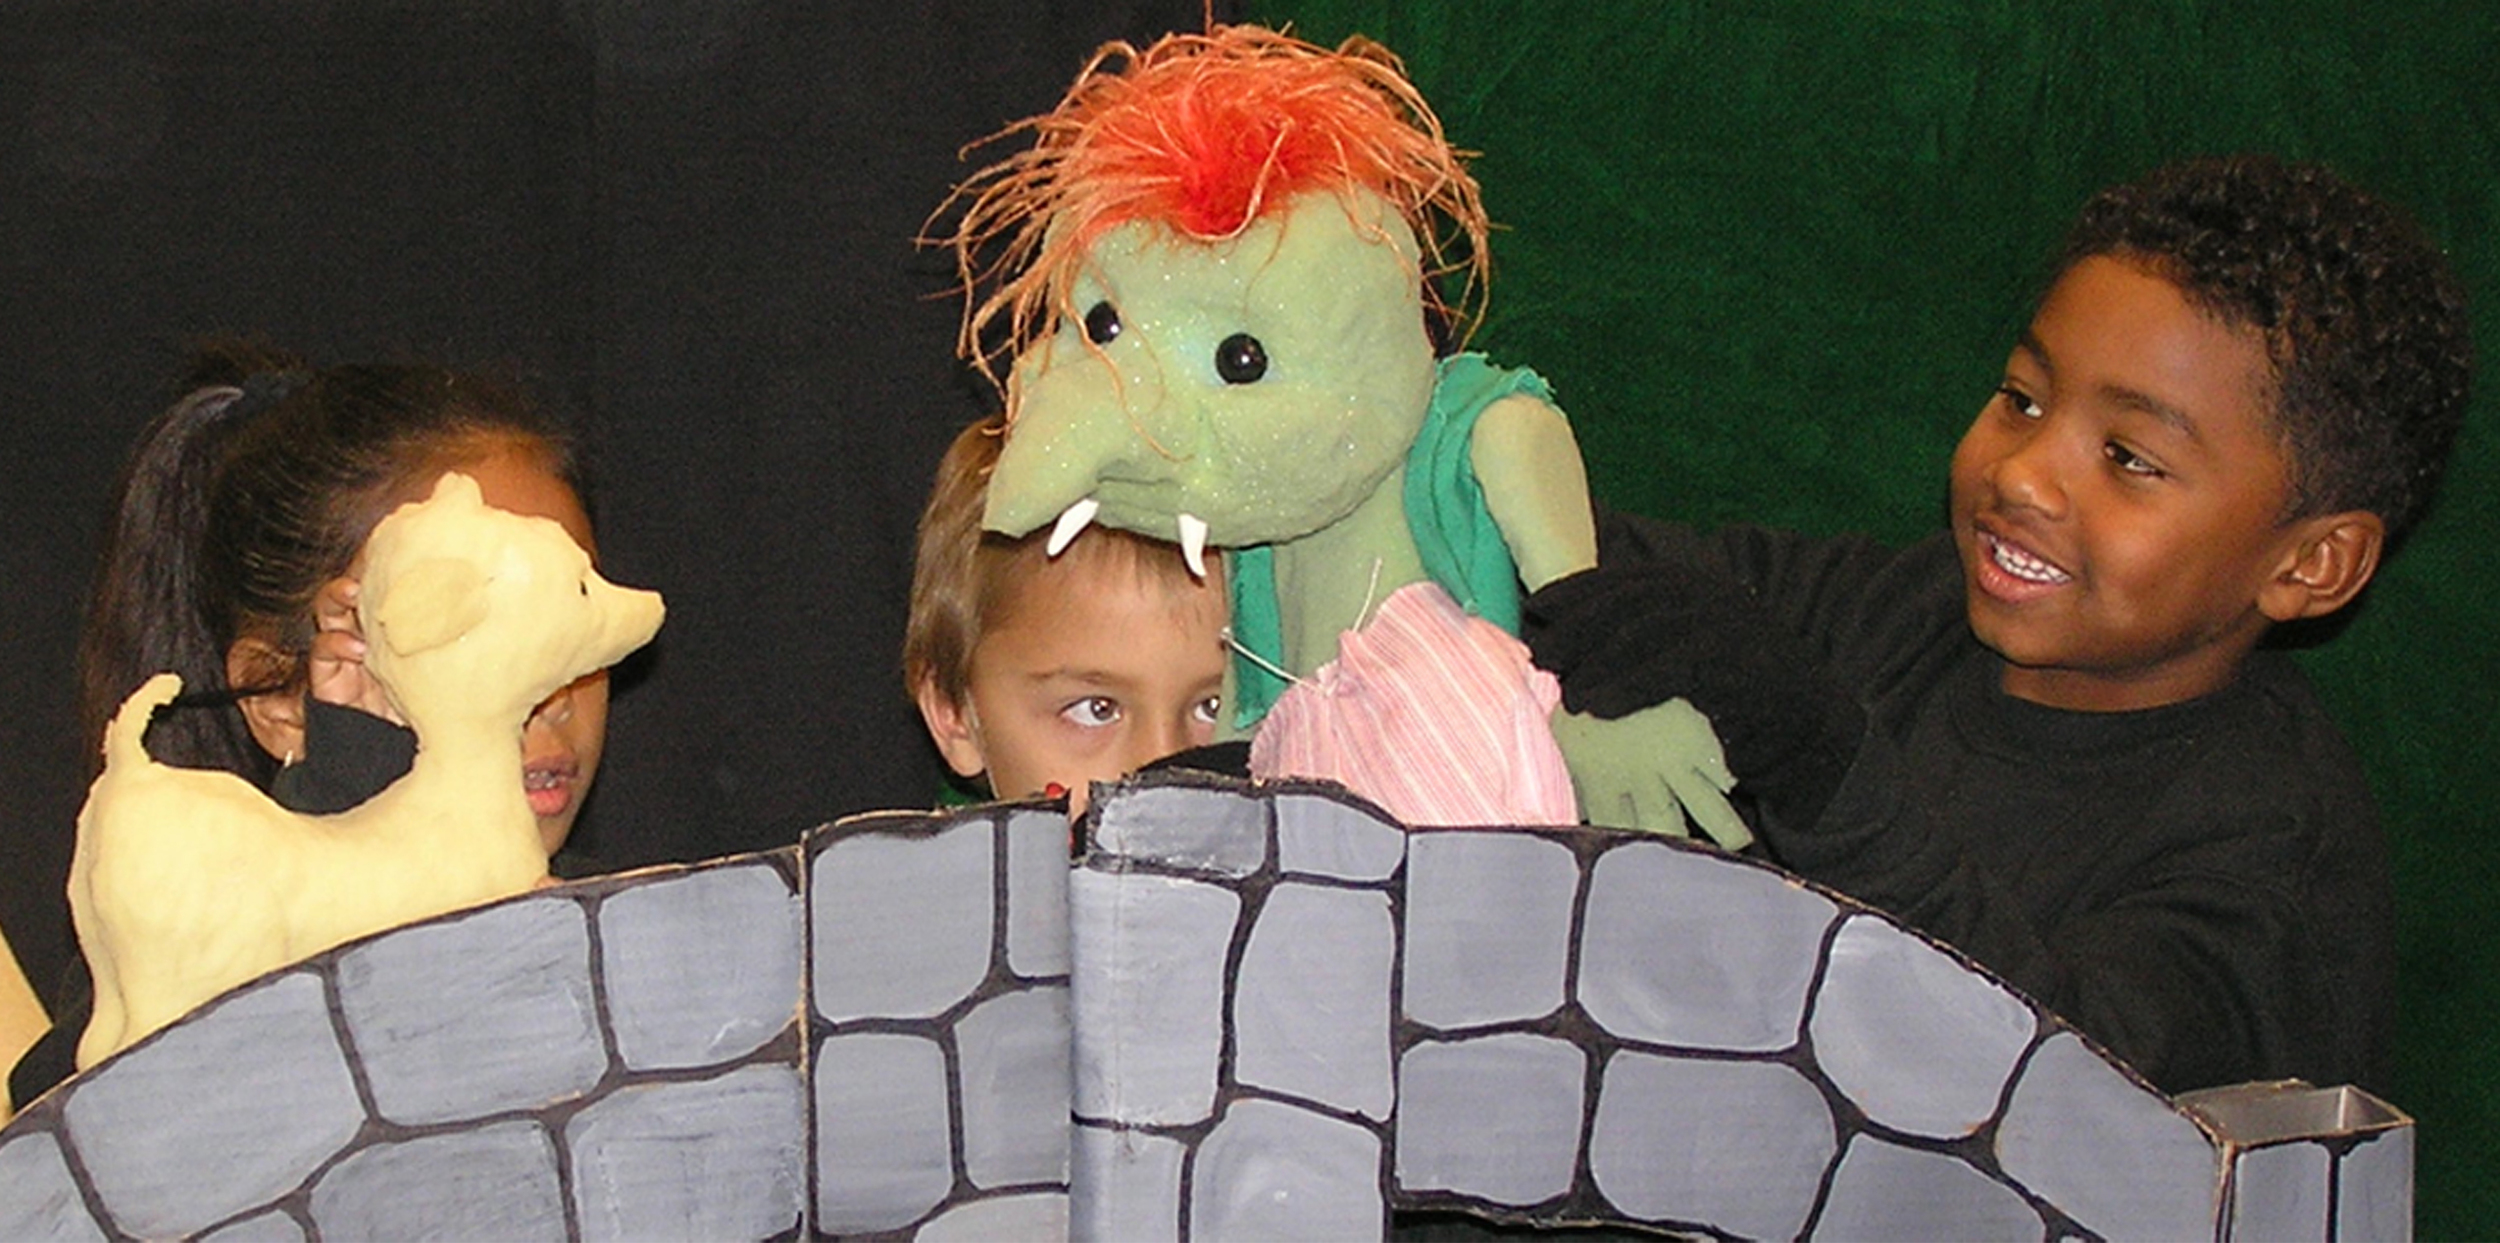 troll bridge play